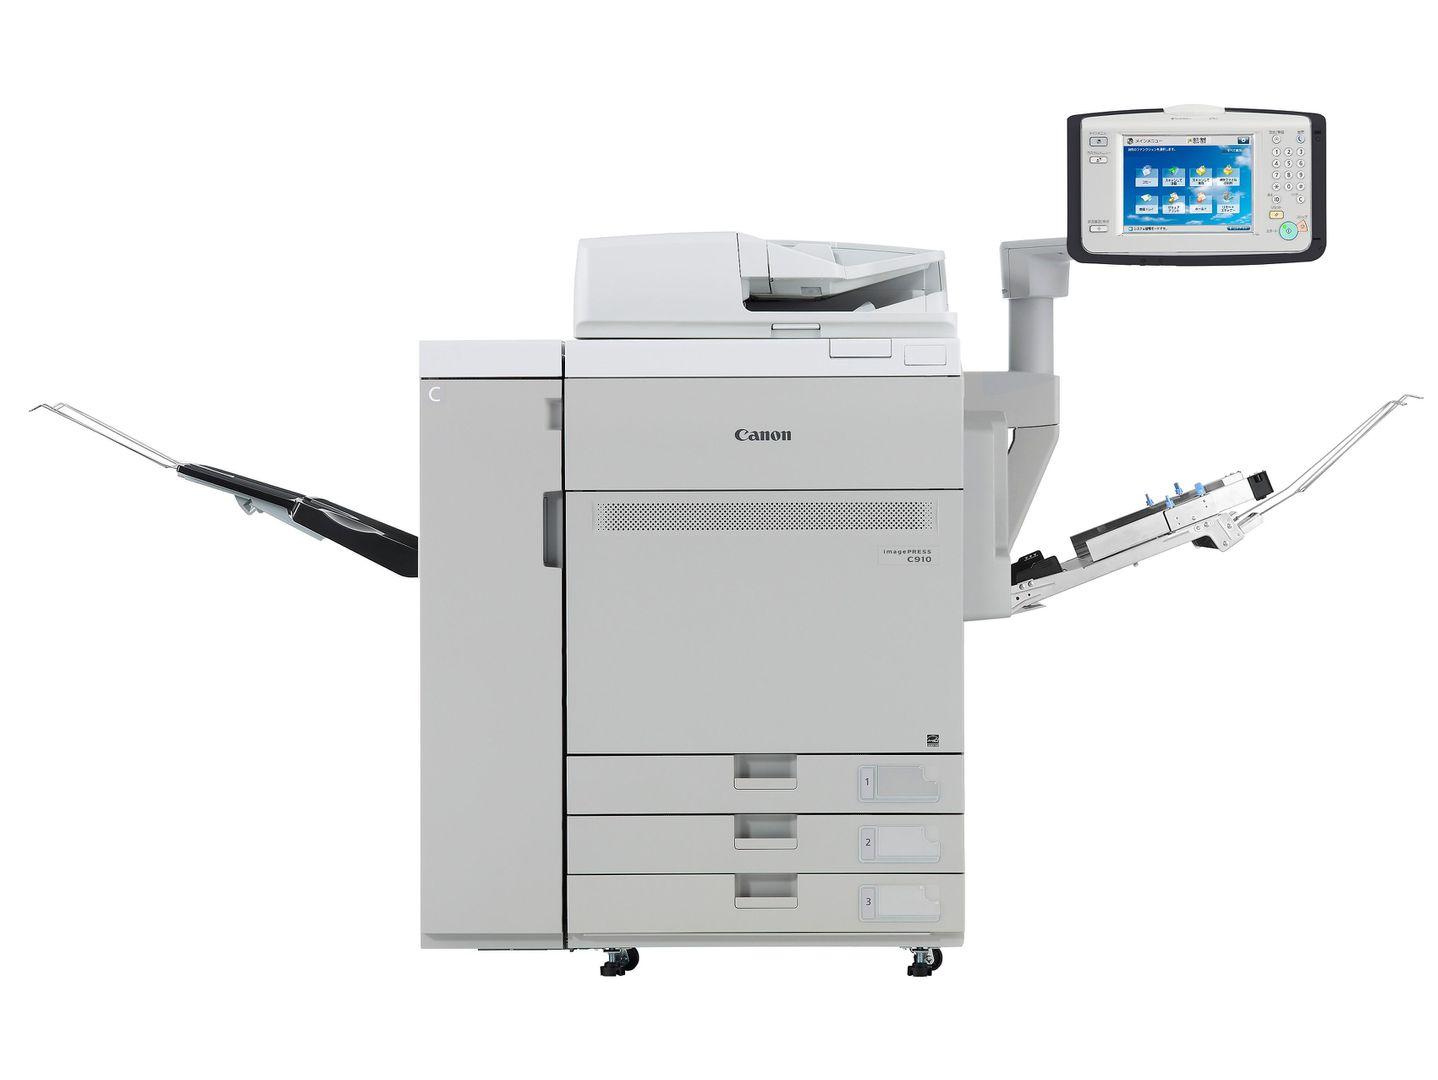 Impresora Canon Multifunción